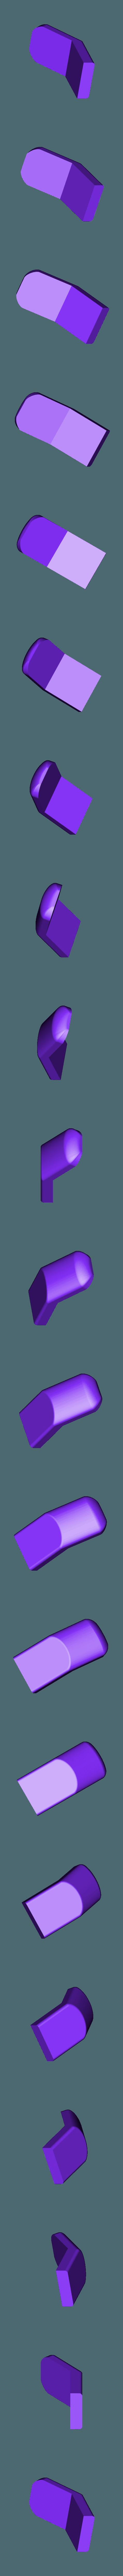 Part5-2.STL Download STL file Tracer pulse bomb. • 3D printable design, Cosple